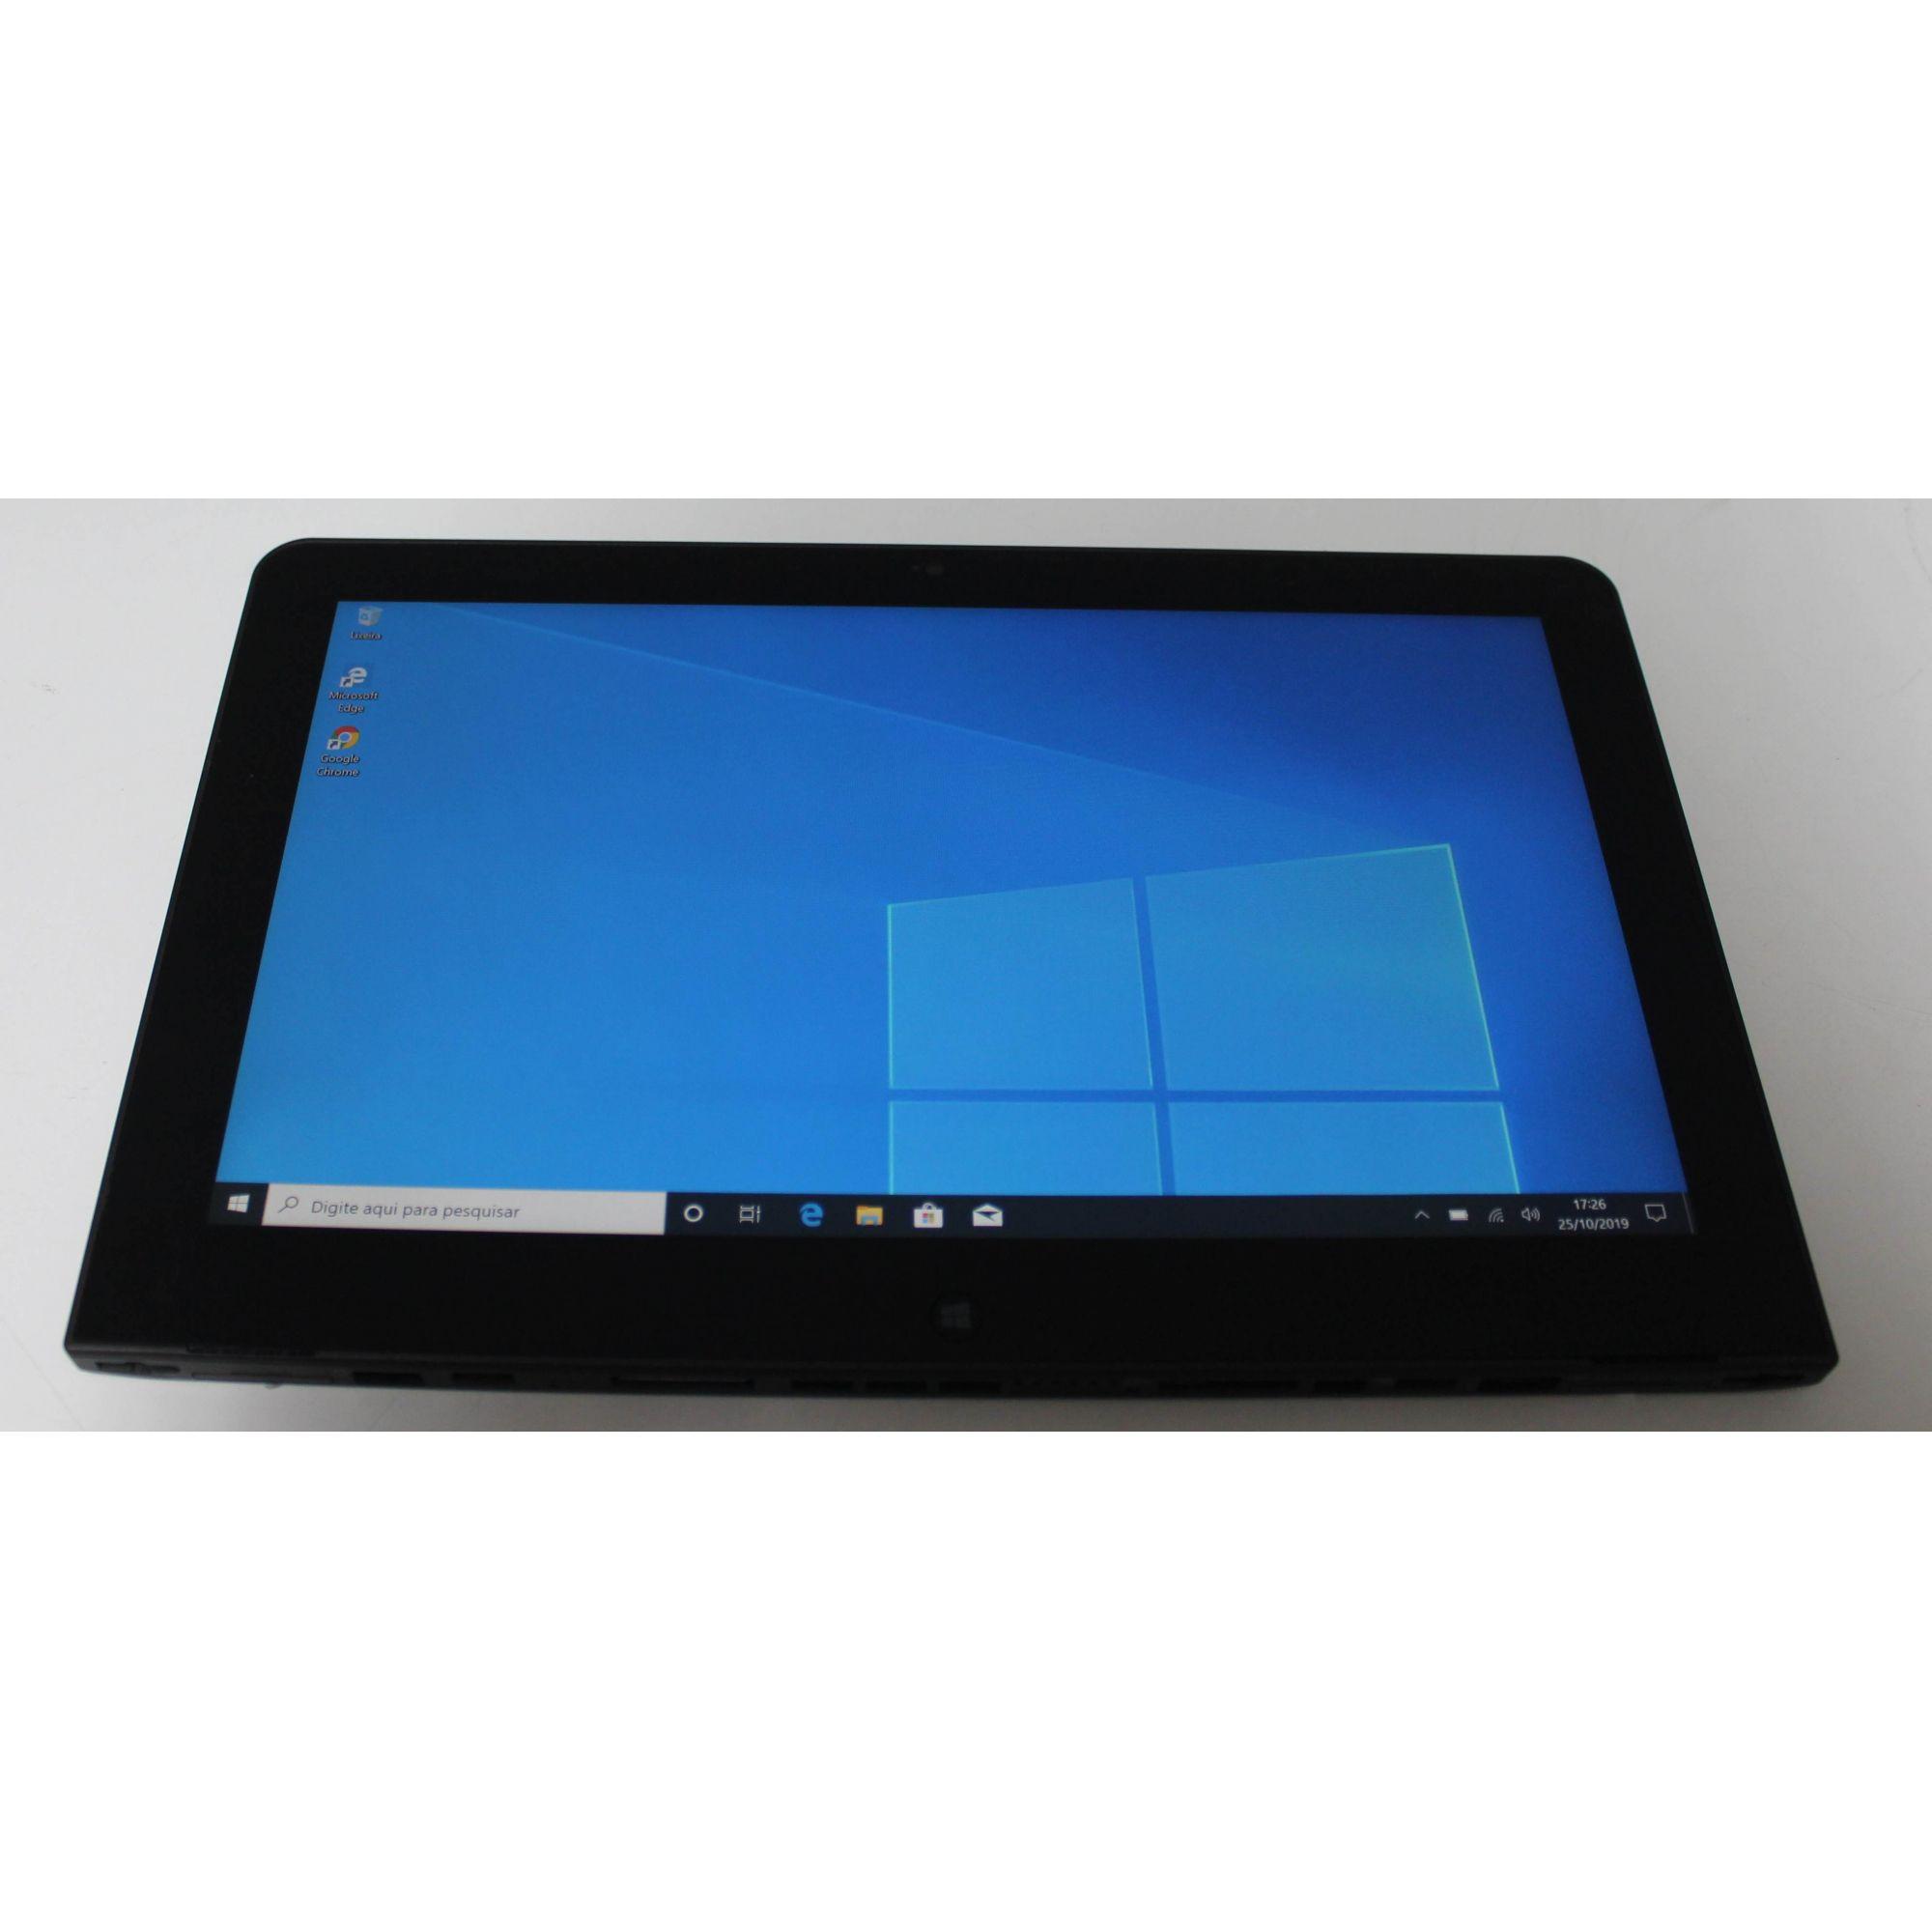 "Notebook Lenovo 2x1 ThinkPad 37027M3 11.6"" Intel Core i7 2.00GHz 8GB SSD-180GB + TOUCH"